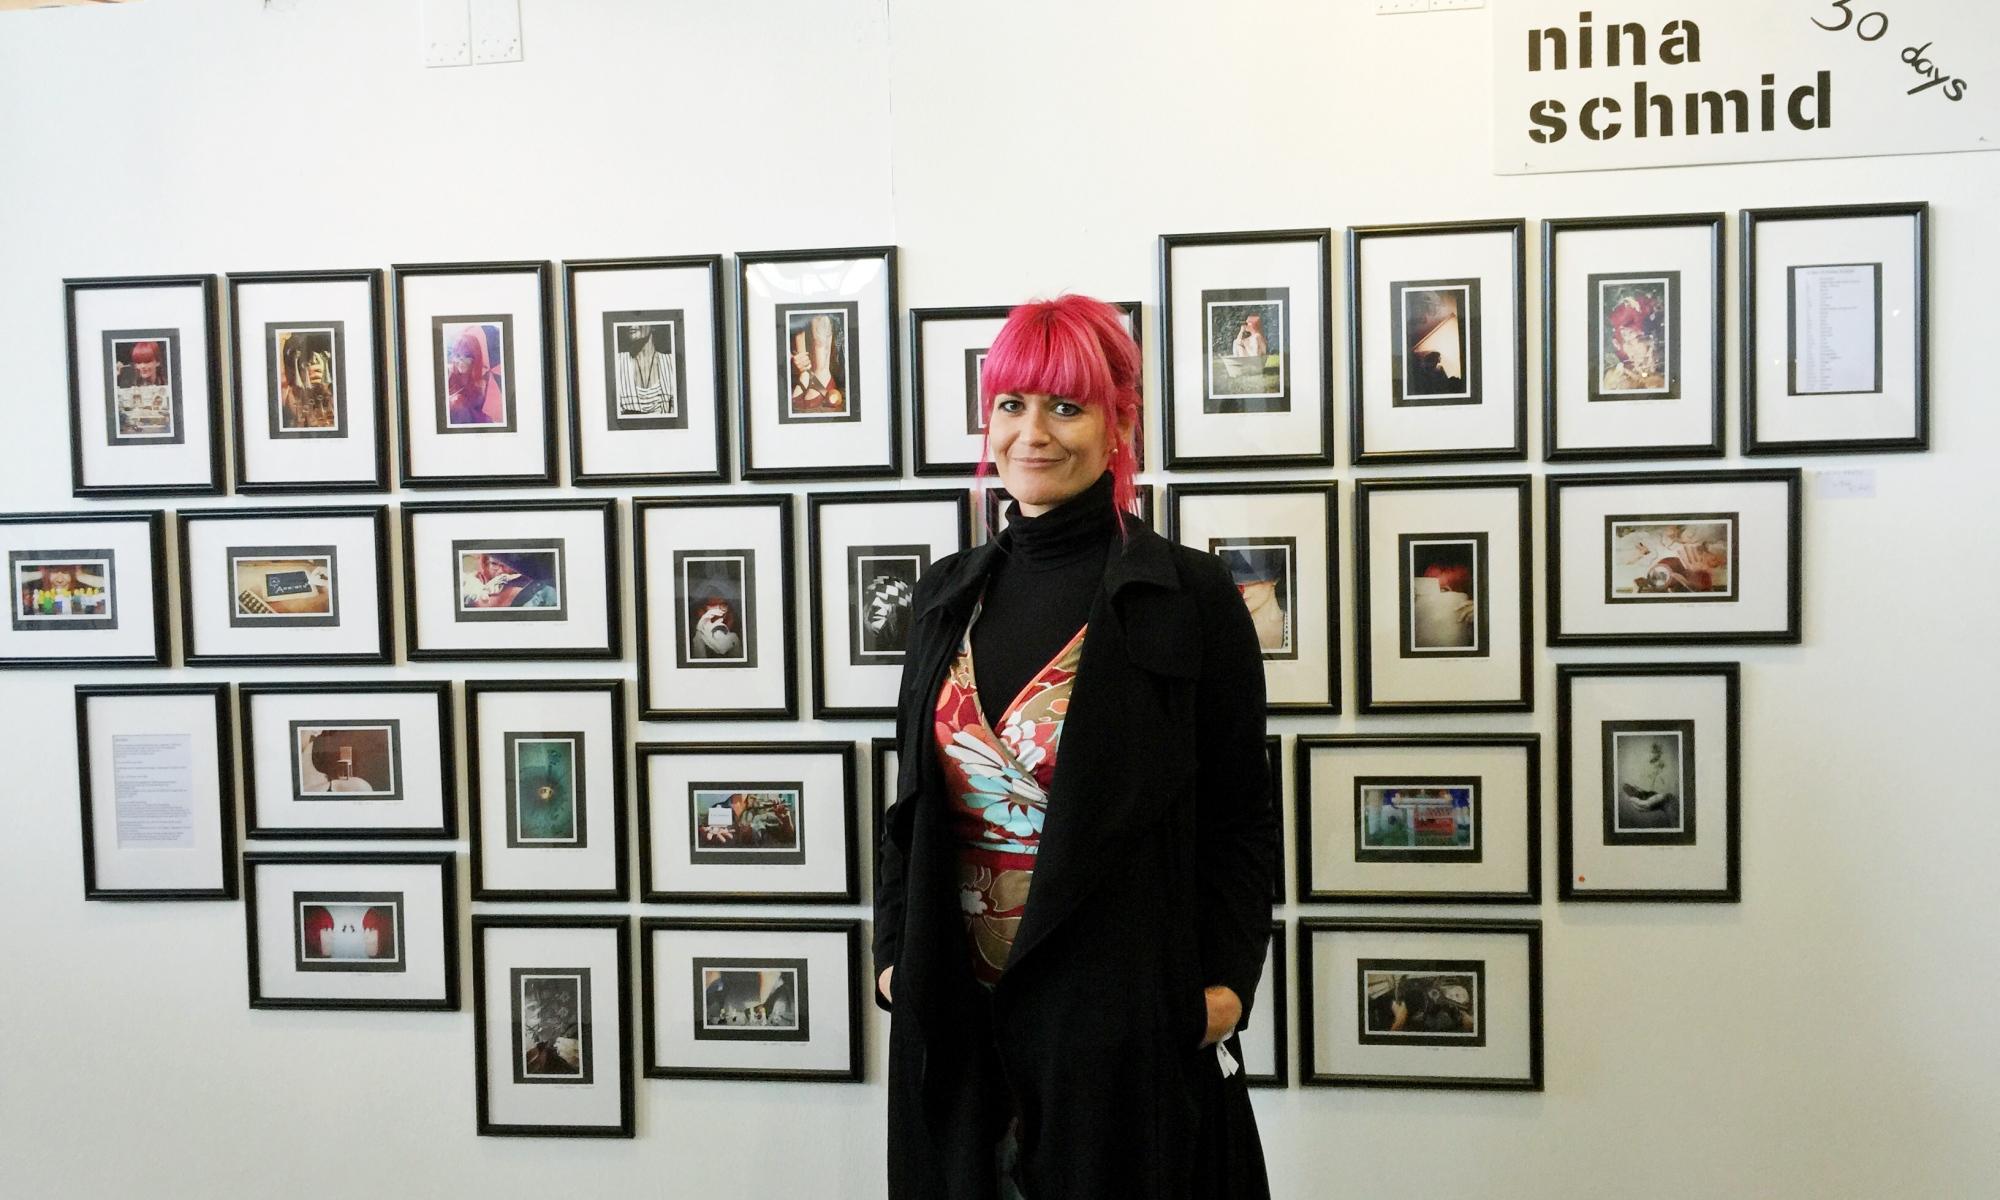 Munich Artists nina schmid at stroke ltd